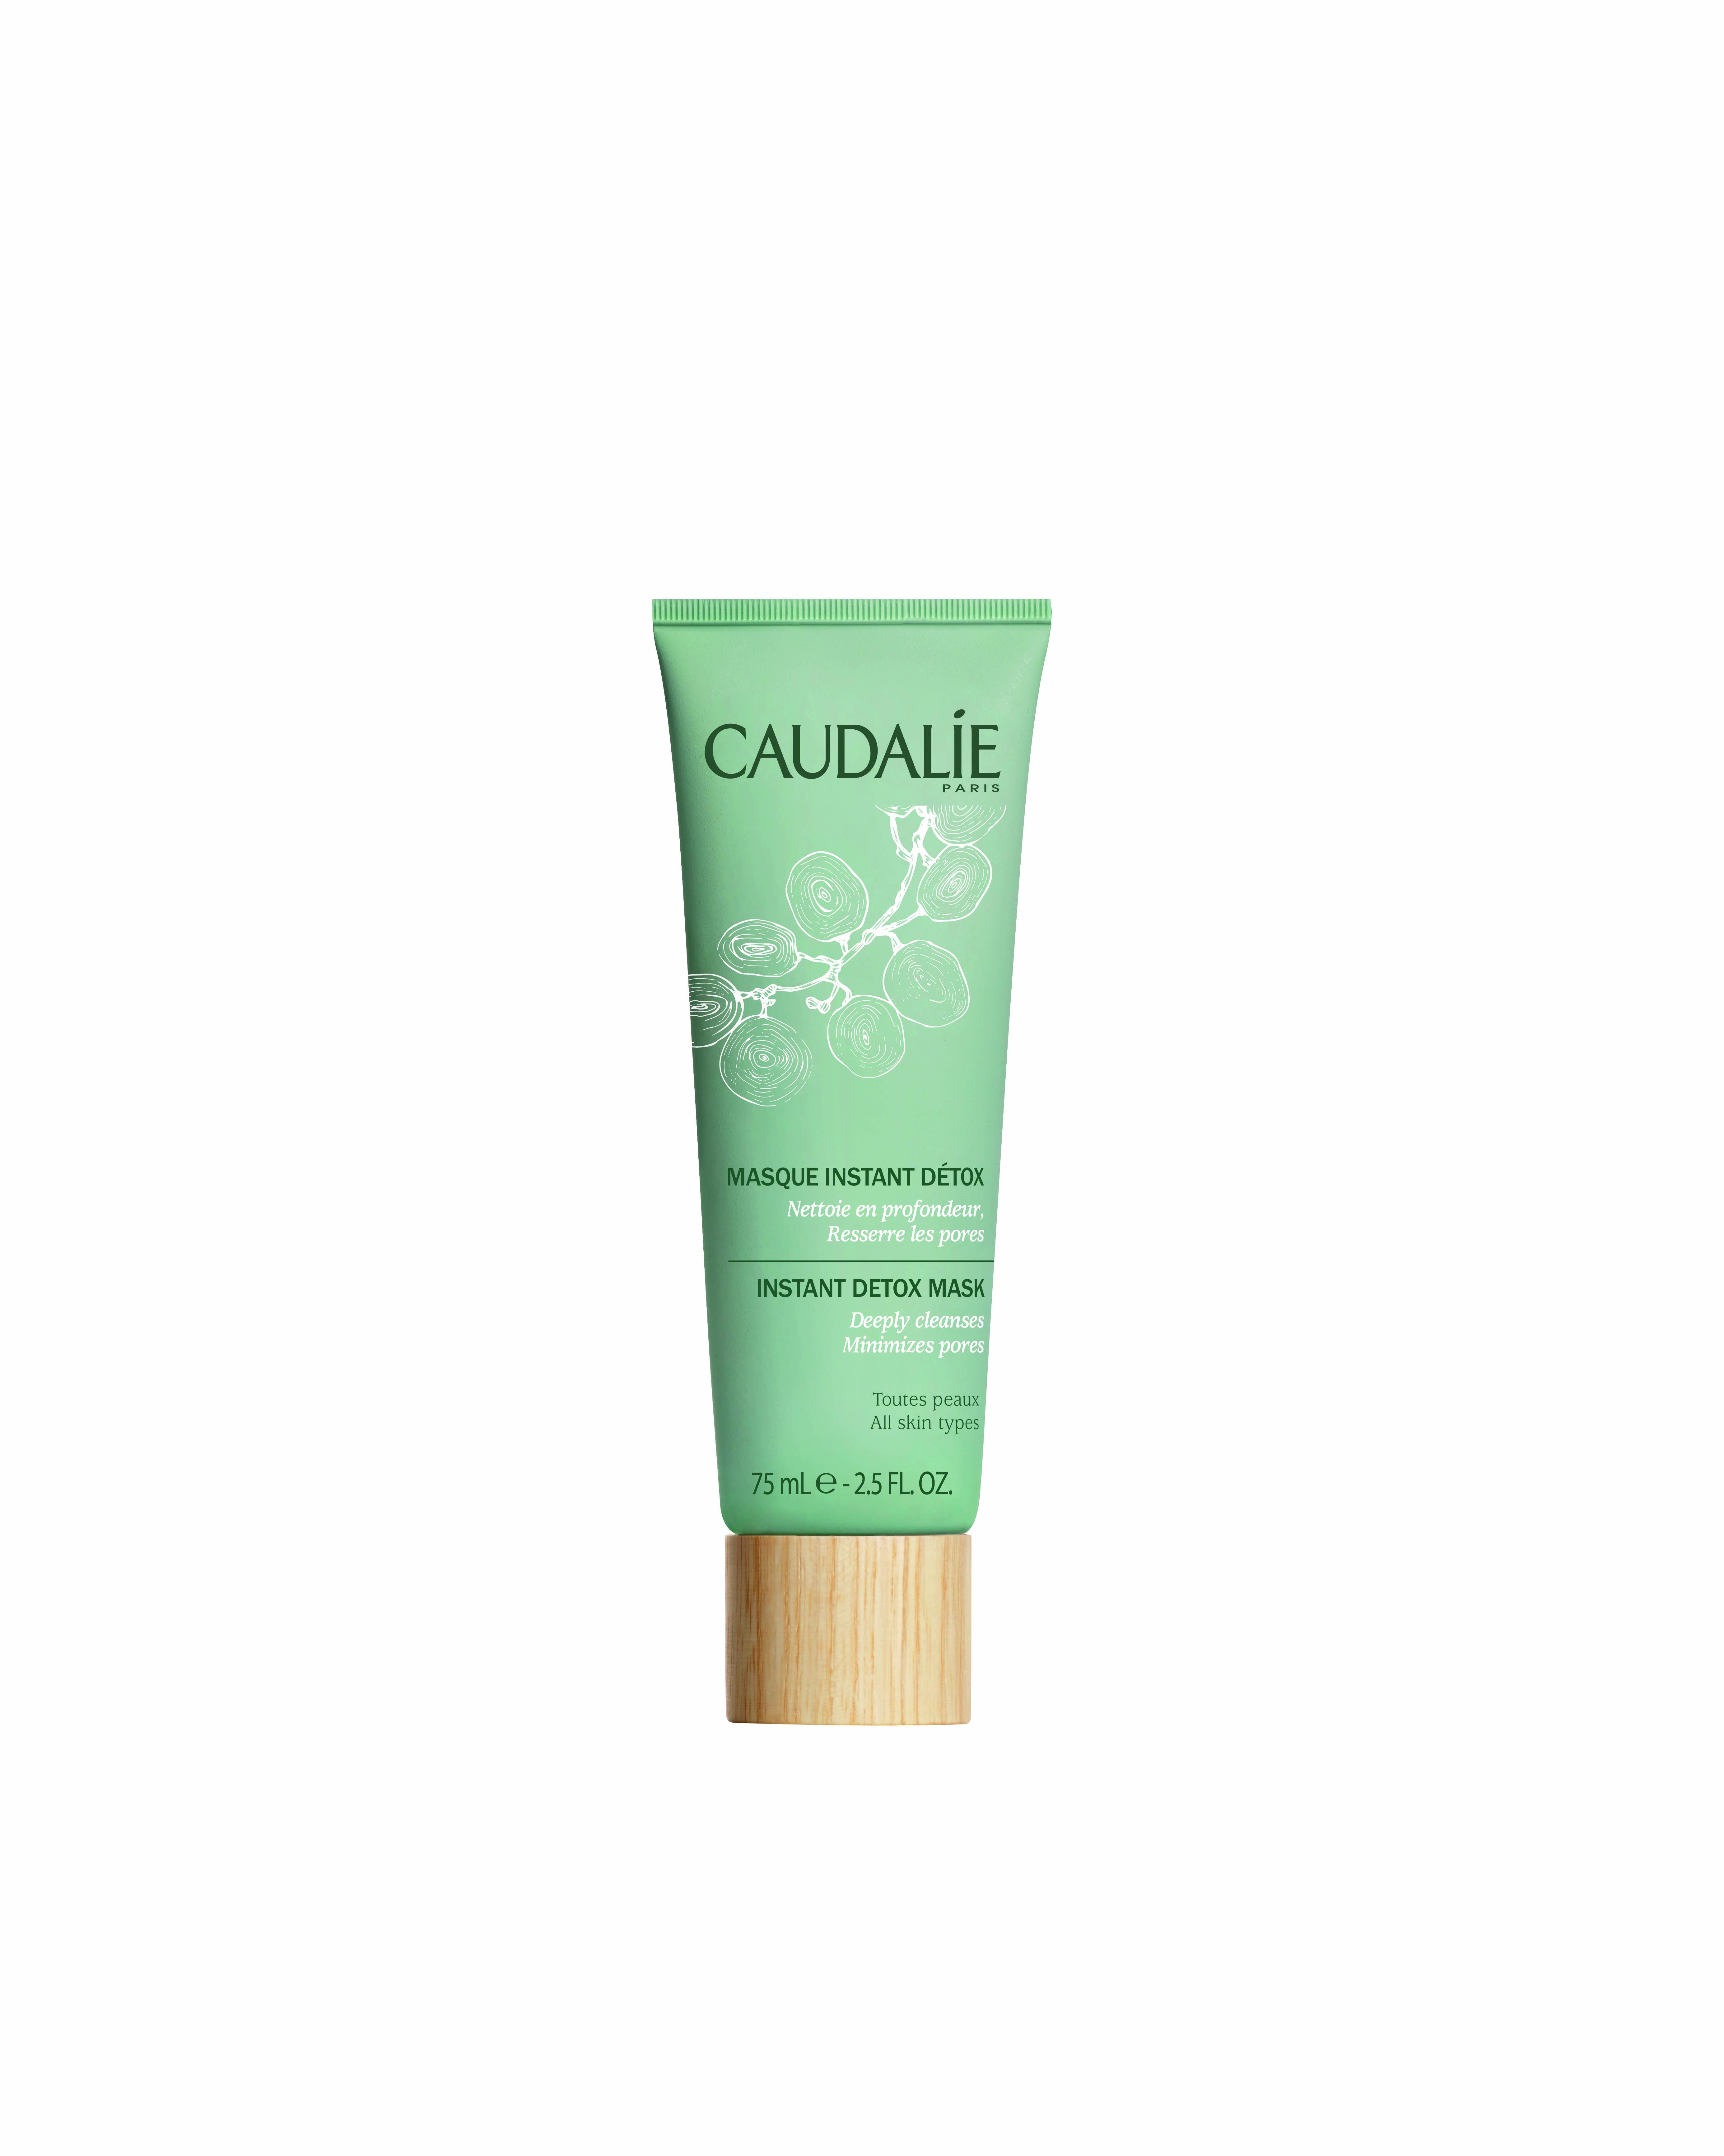 Caudalie - Instant Detox Mask 75 ml